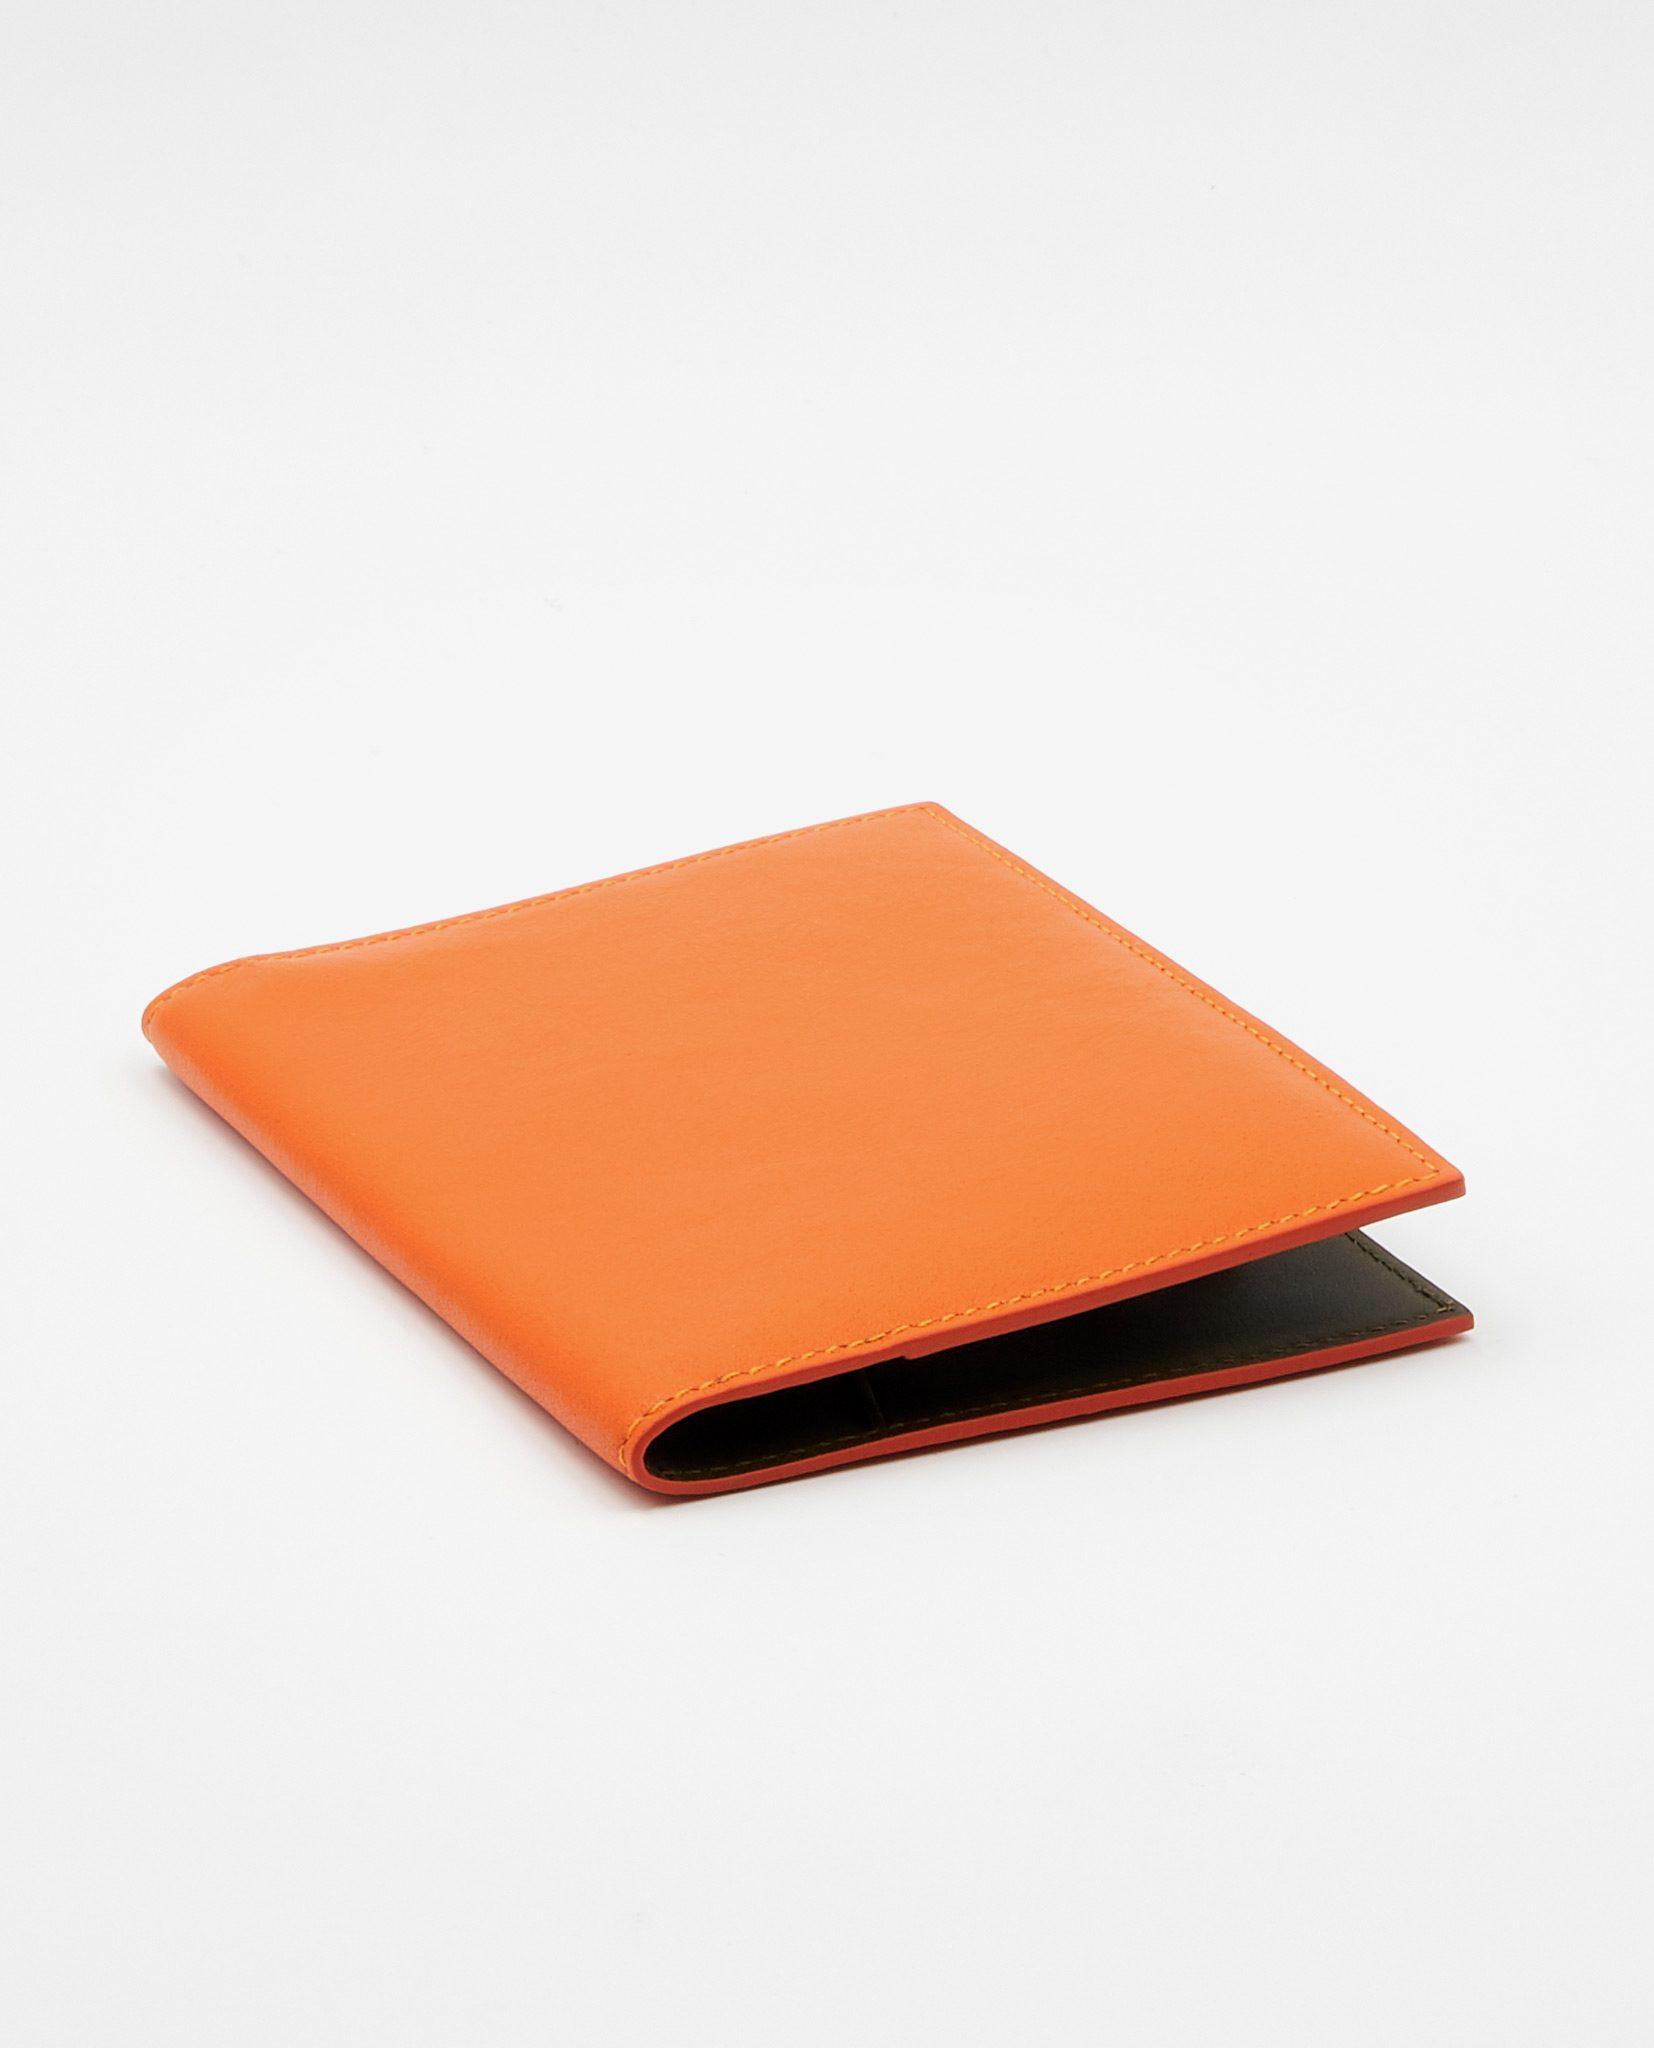 Soofre Smooth Leather Passport Holder Color Orange Khaki